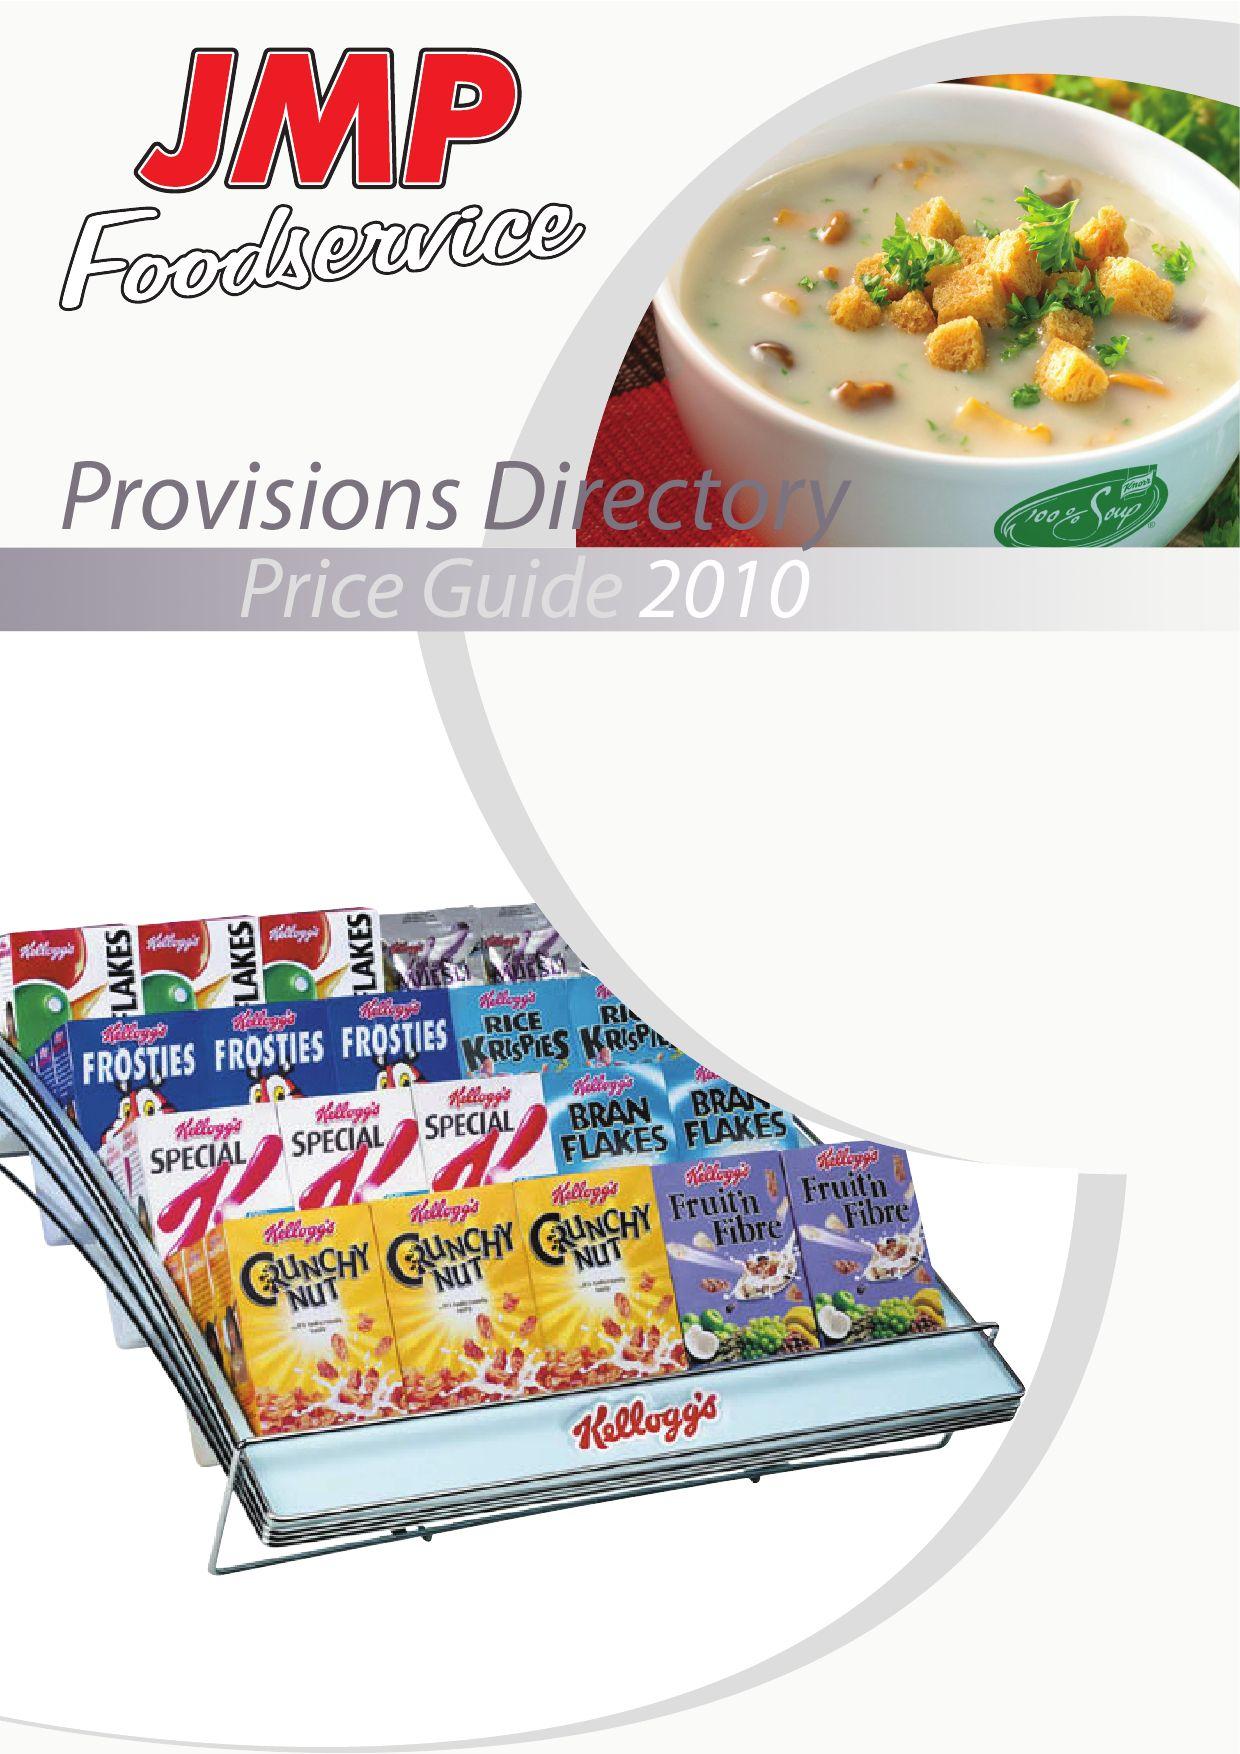 Jmp Foodservice Grocery Brochure 2010 By Infotech Studio Issuu Tropicana Slim Milk Low Fat Vanilla 500gr